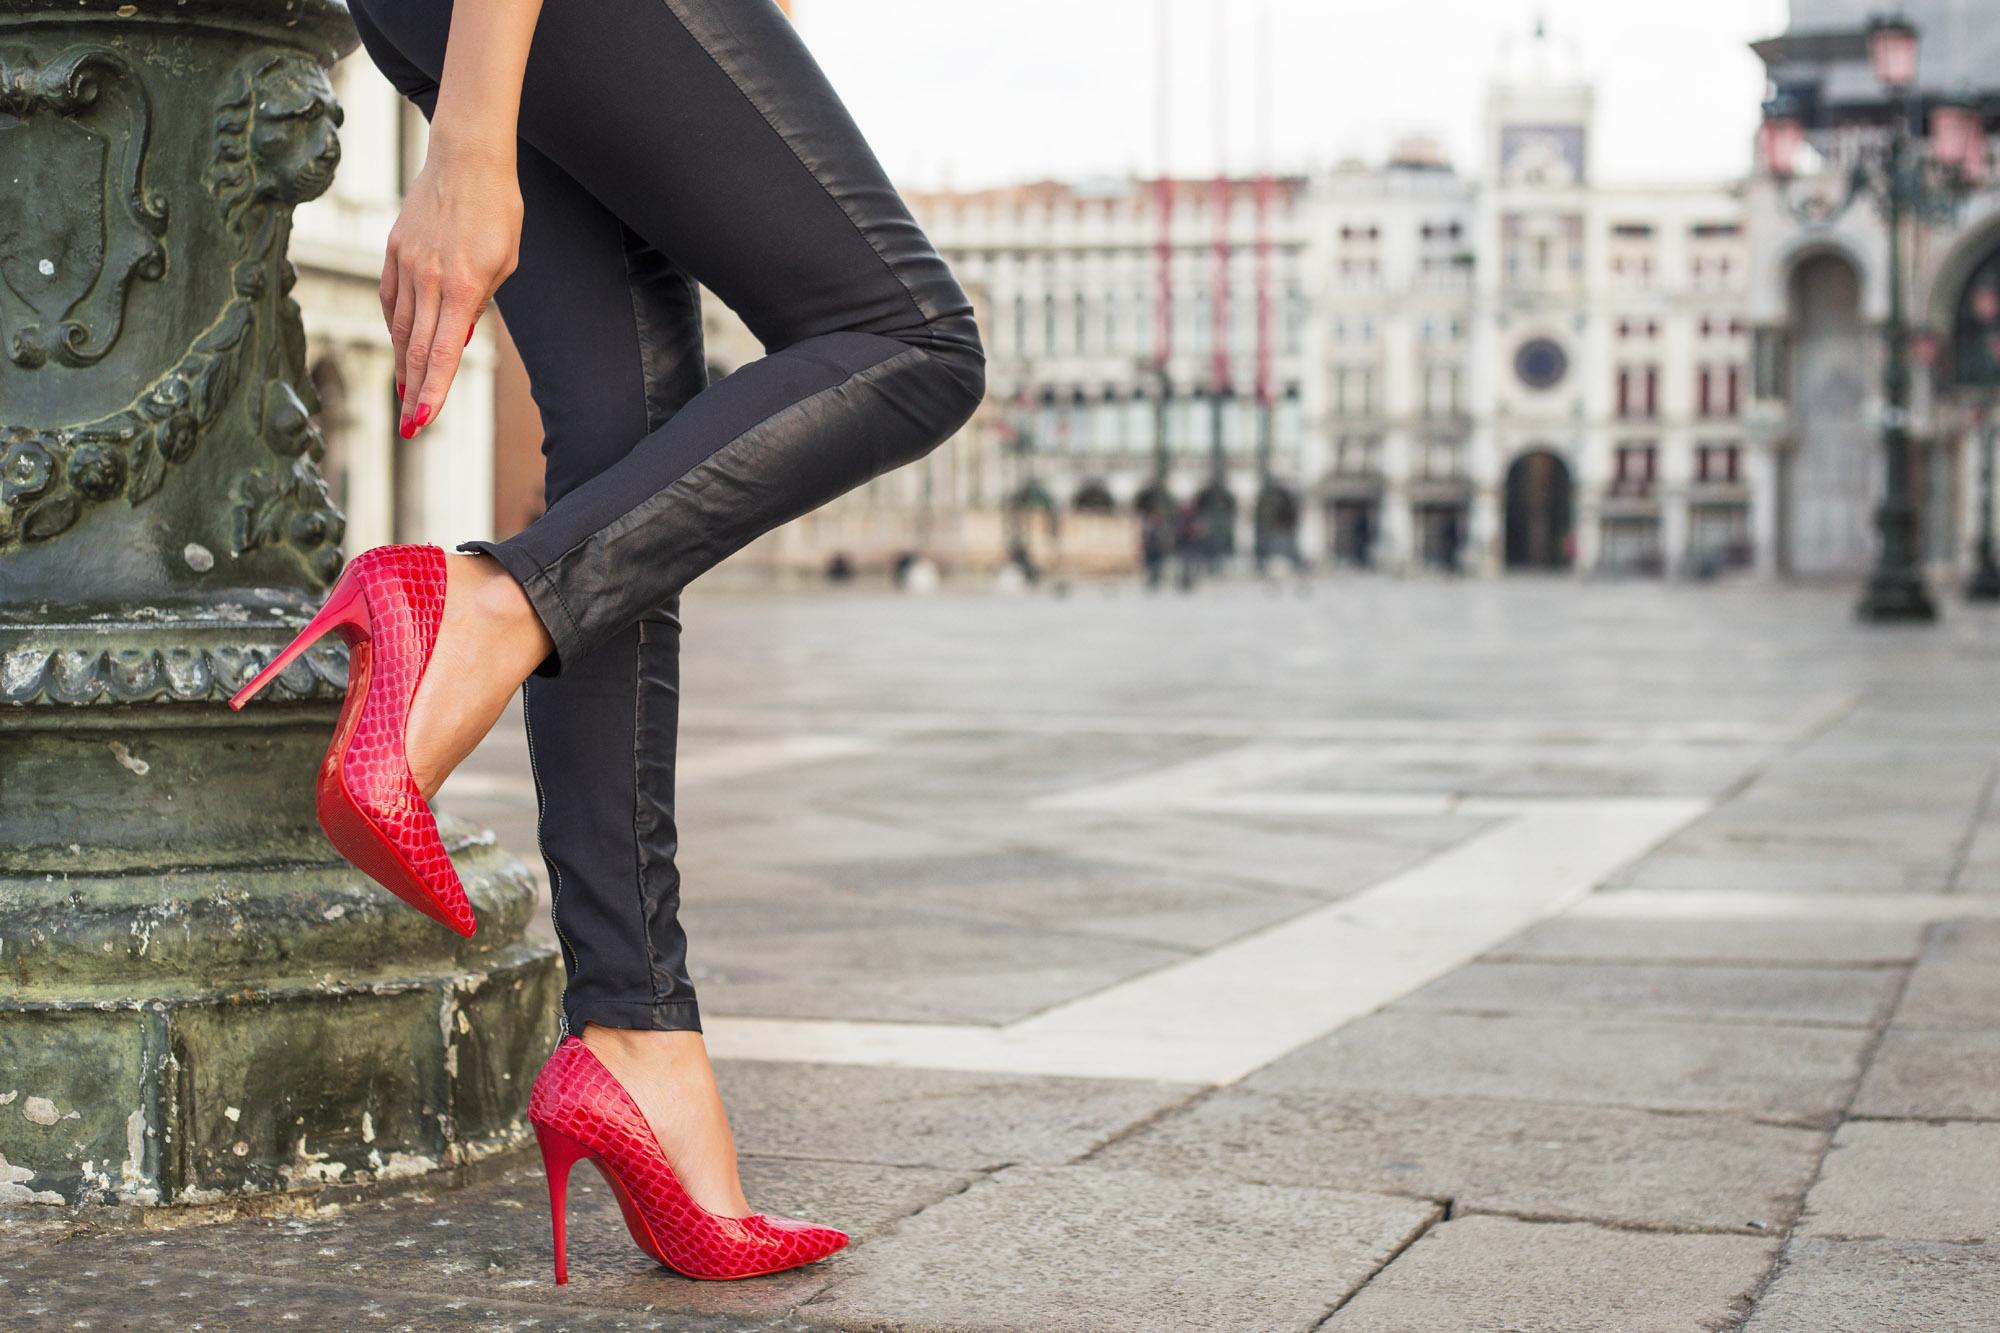 Photo of Ini Adalah Satu-Satunya Tip Untuk Pemakaian High Heels Yang Lebih Selesa